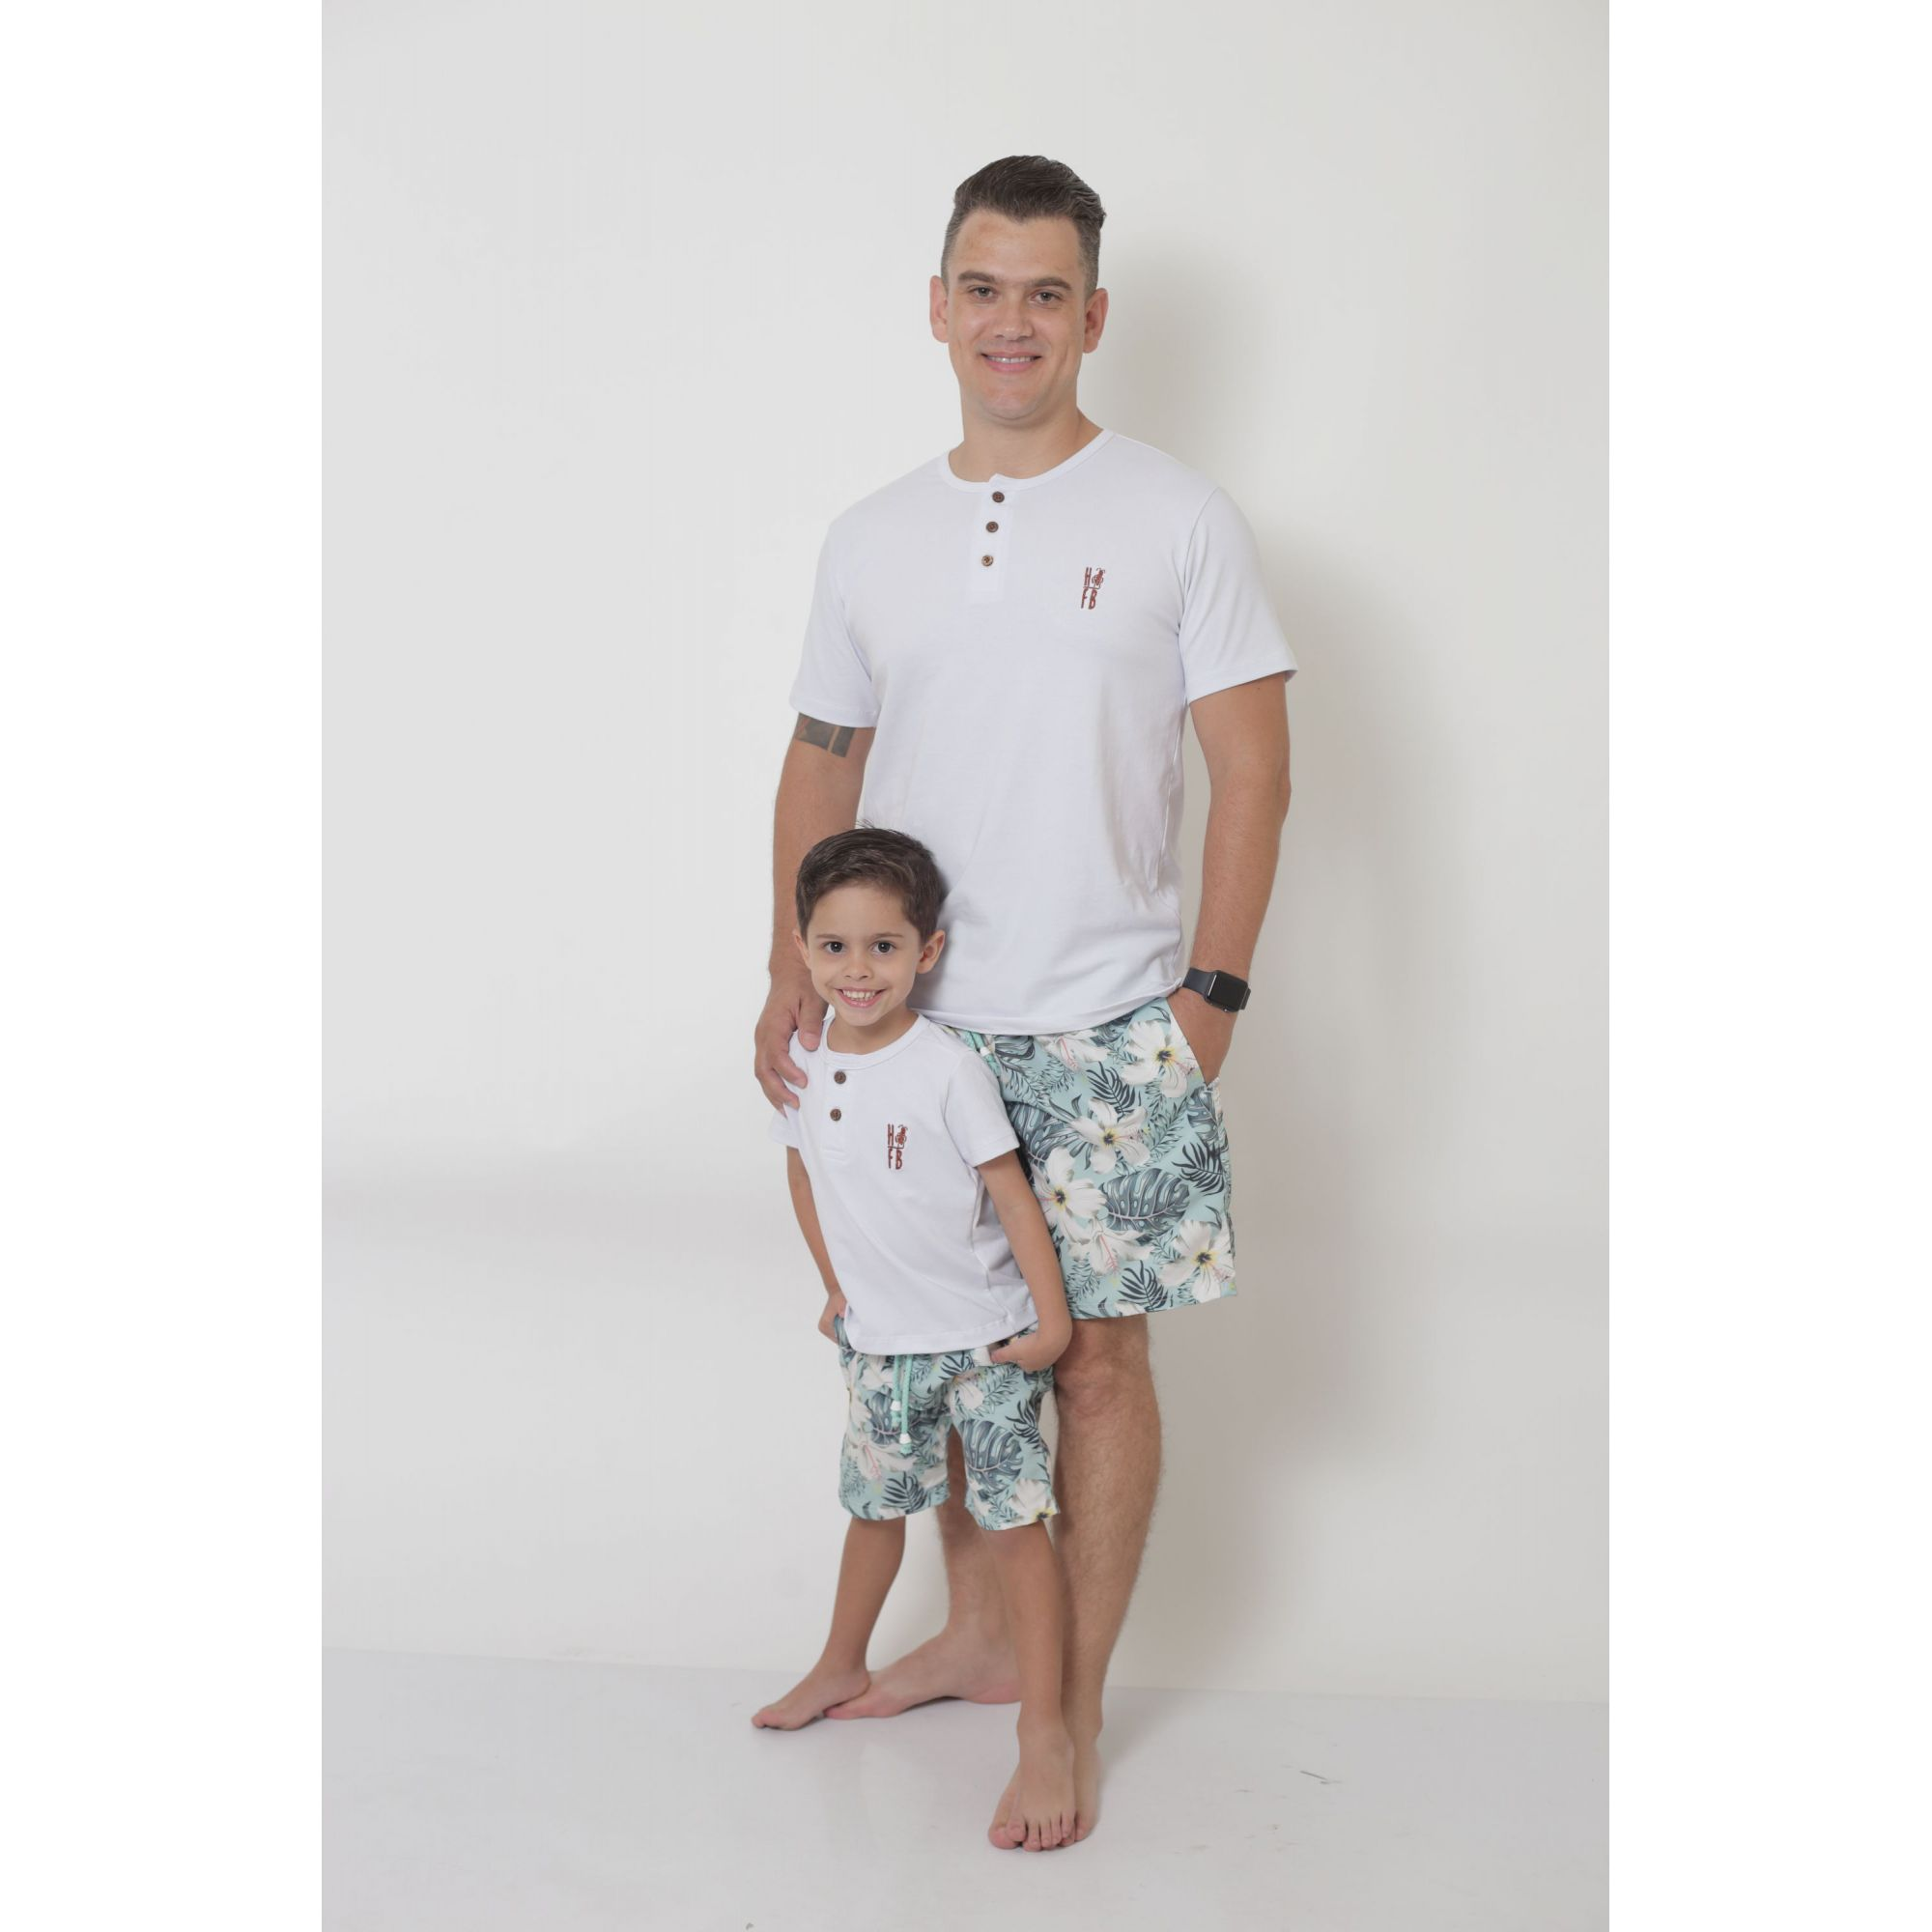 PAI E FILHO > Kit 02 Bermudas Flores Tactel [Coleção Tal Pai Tal Filho]  - Heitor Fashion Brazil